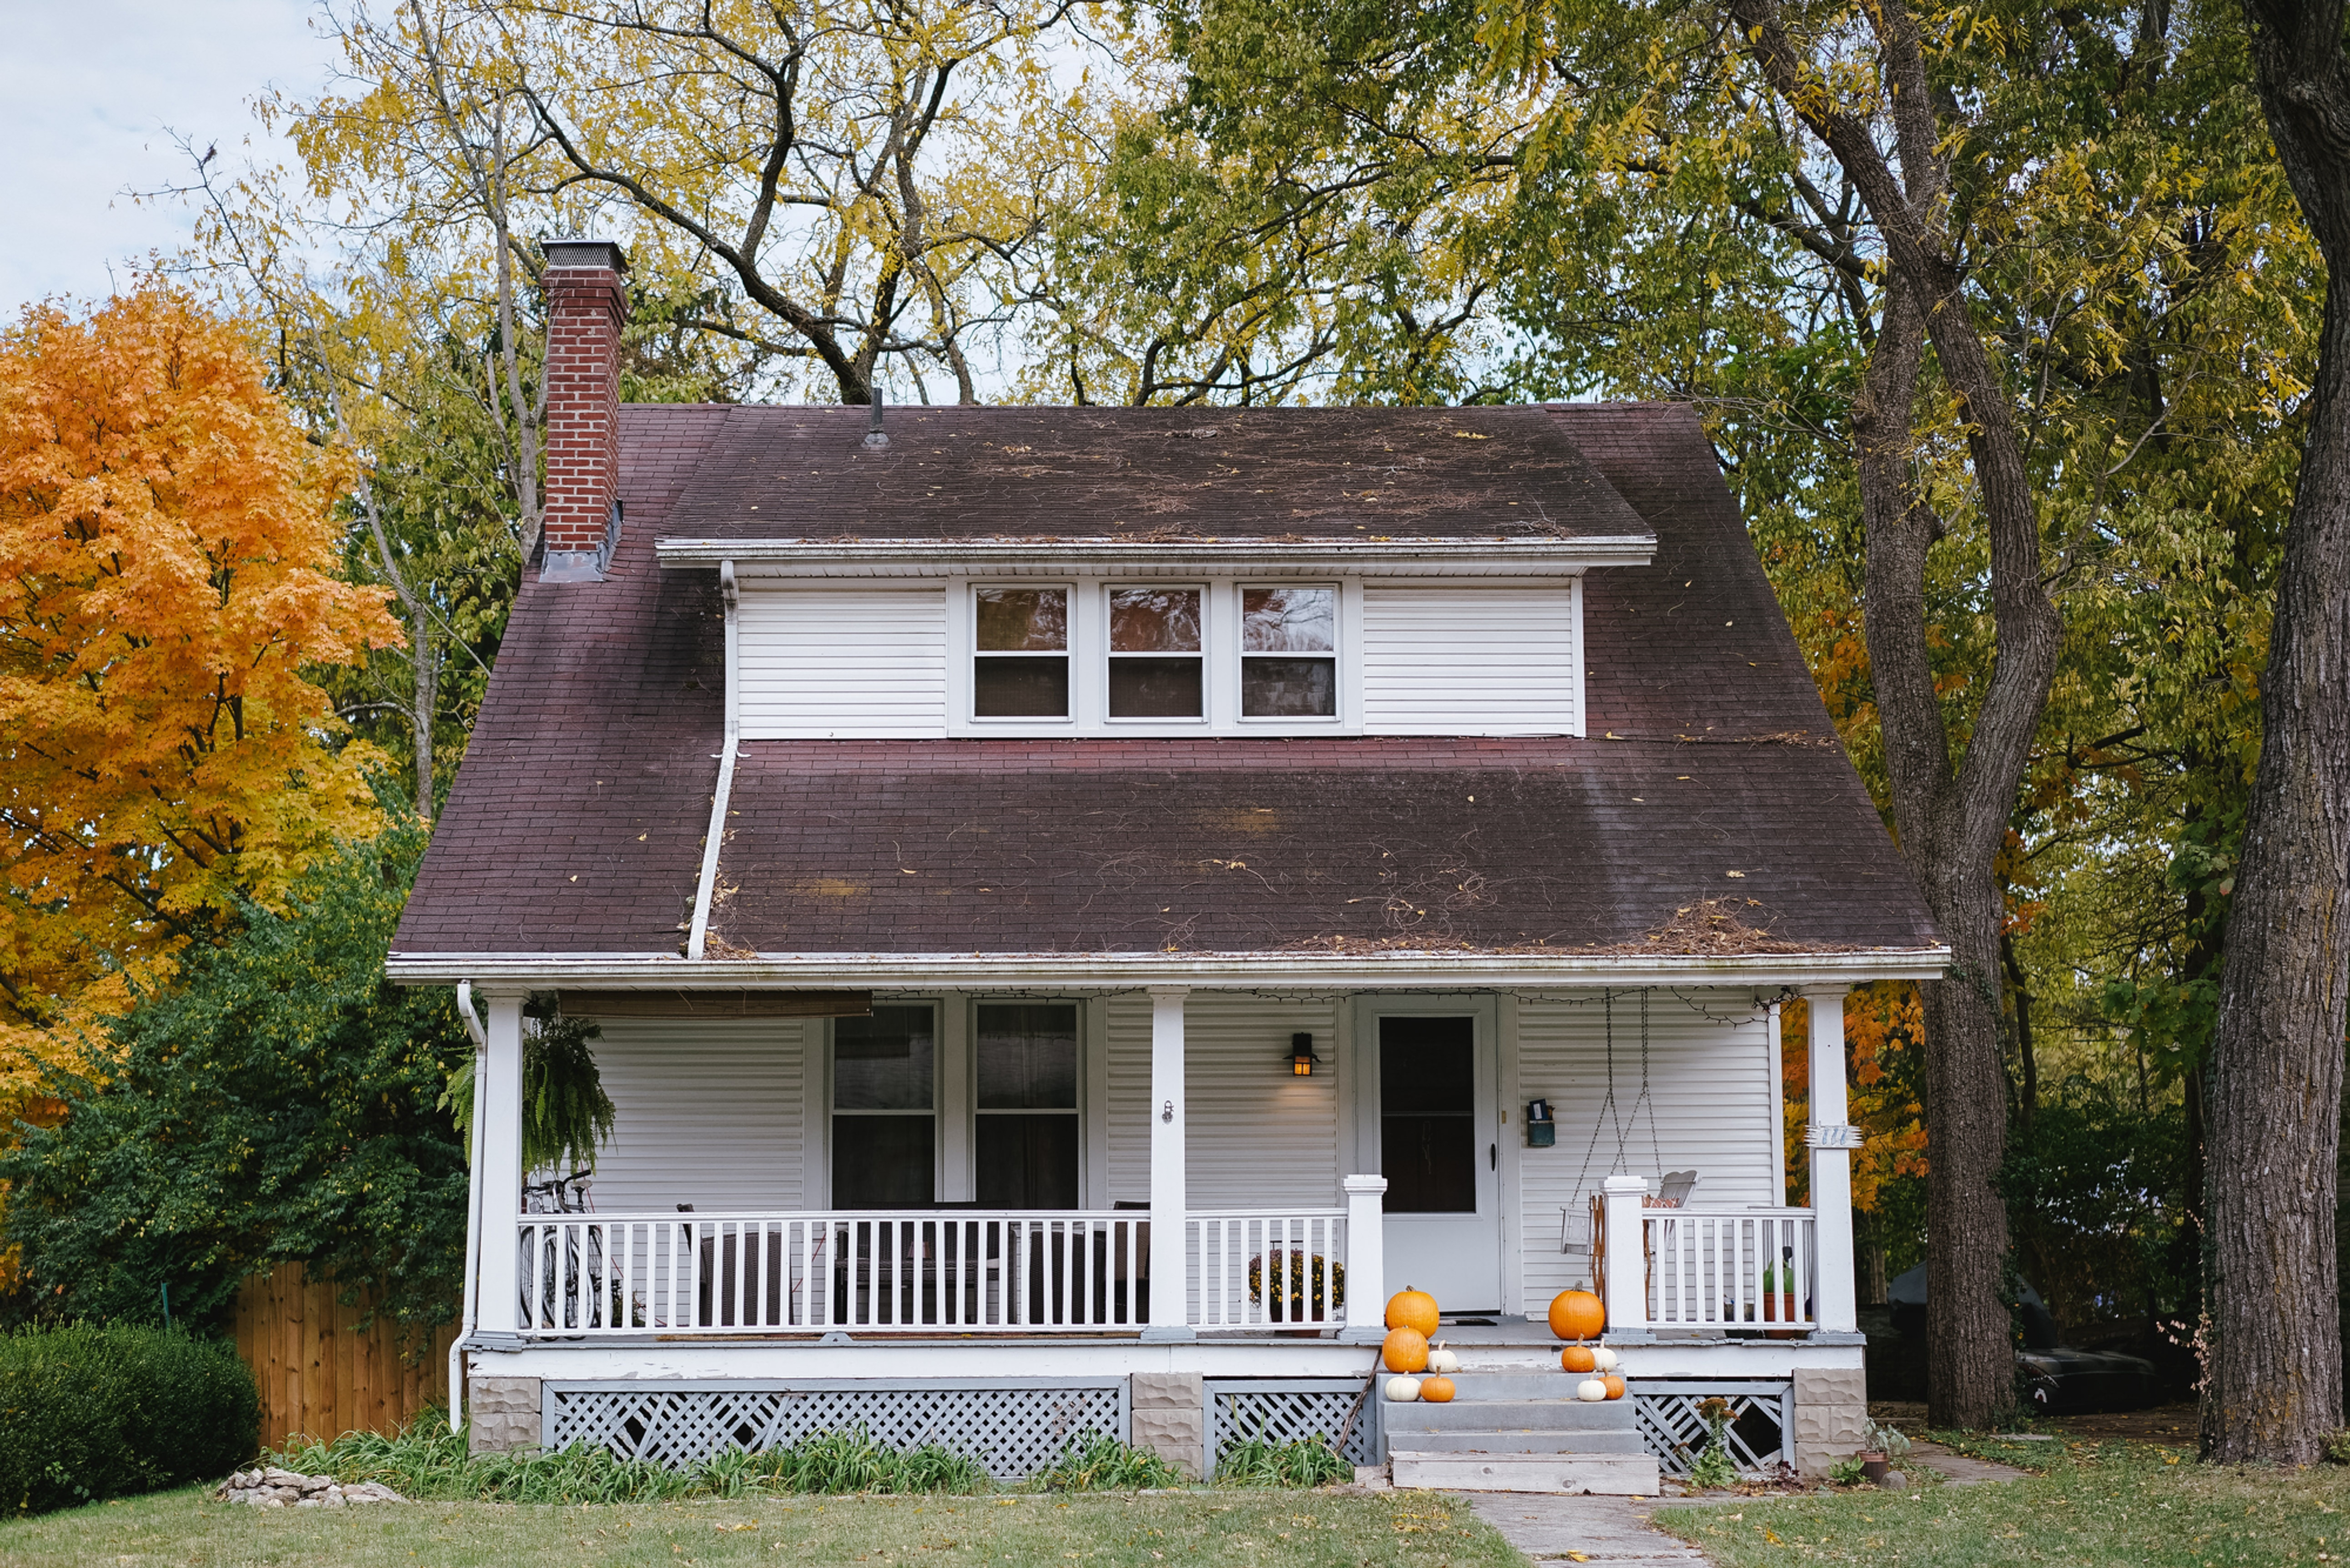 Real Estate for Sale | Investors | Cash Offers for Homes ...